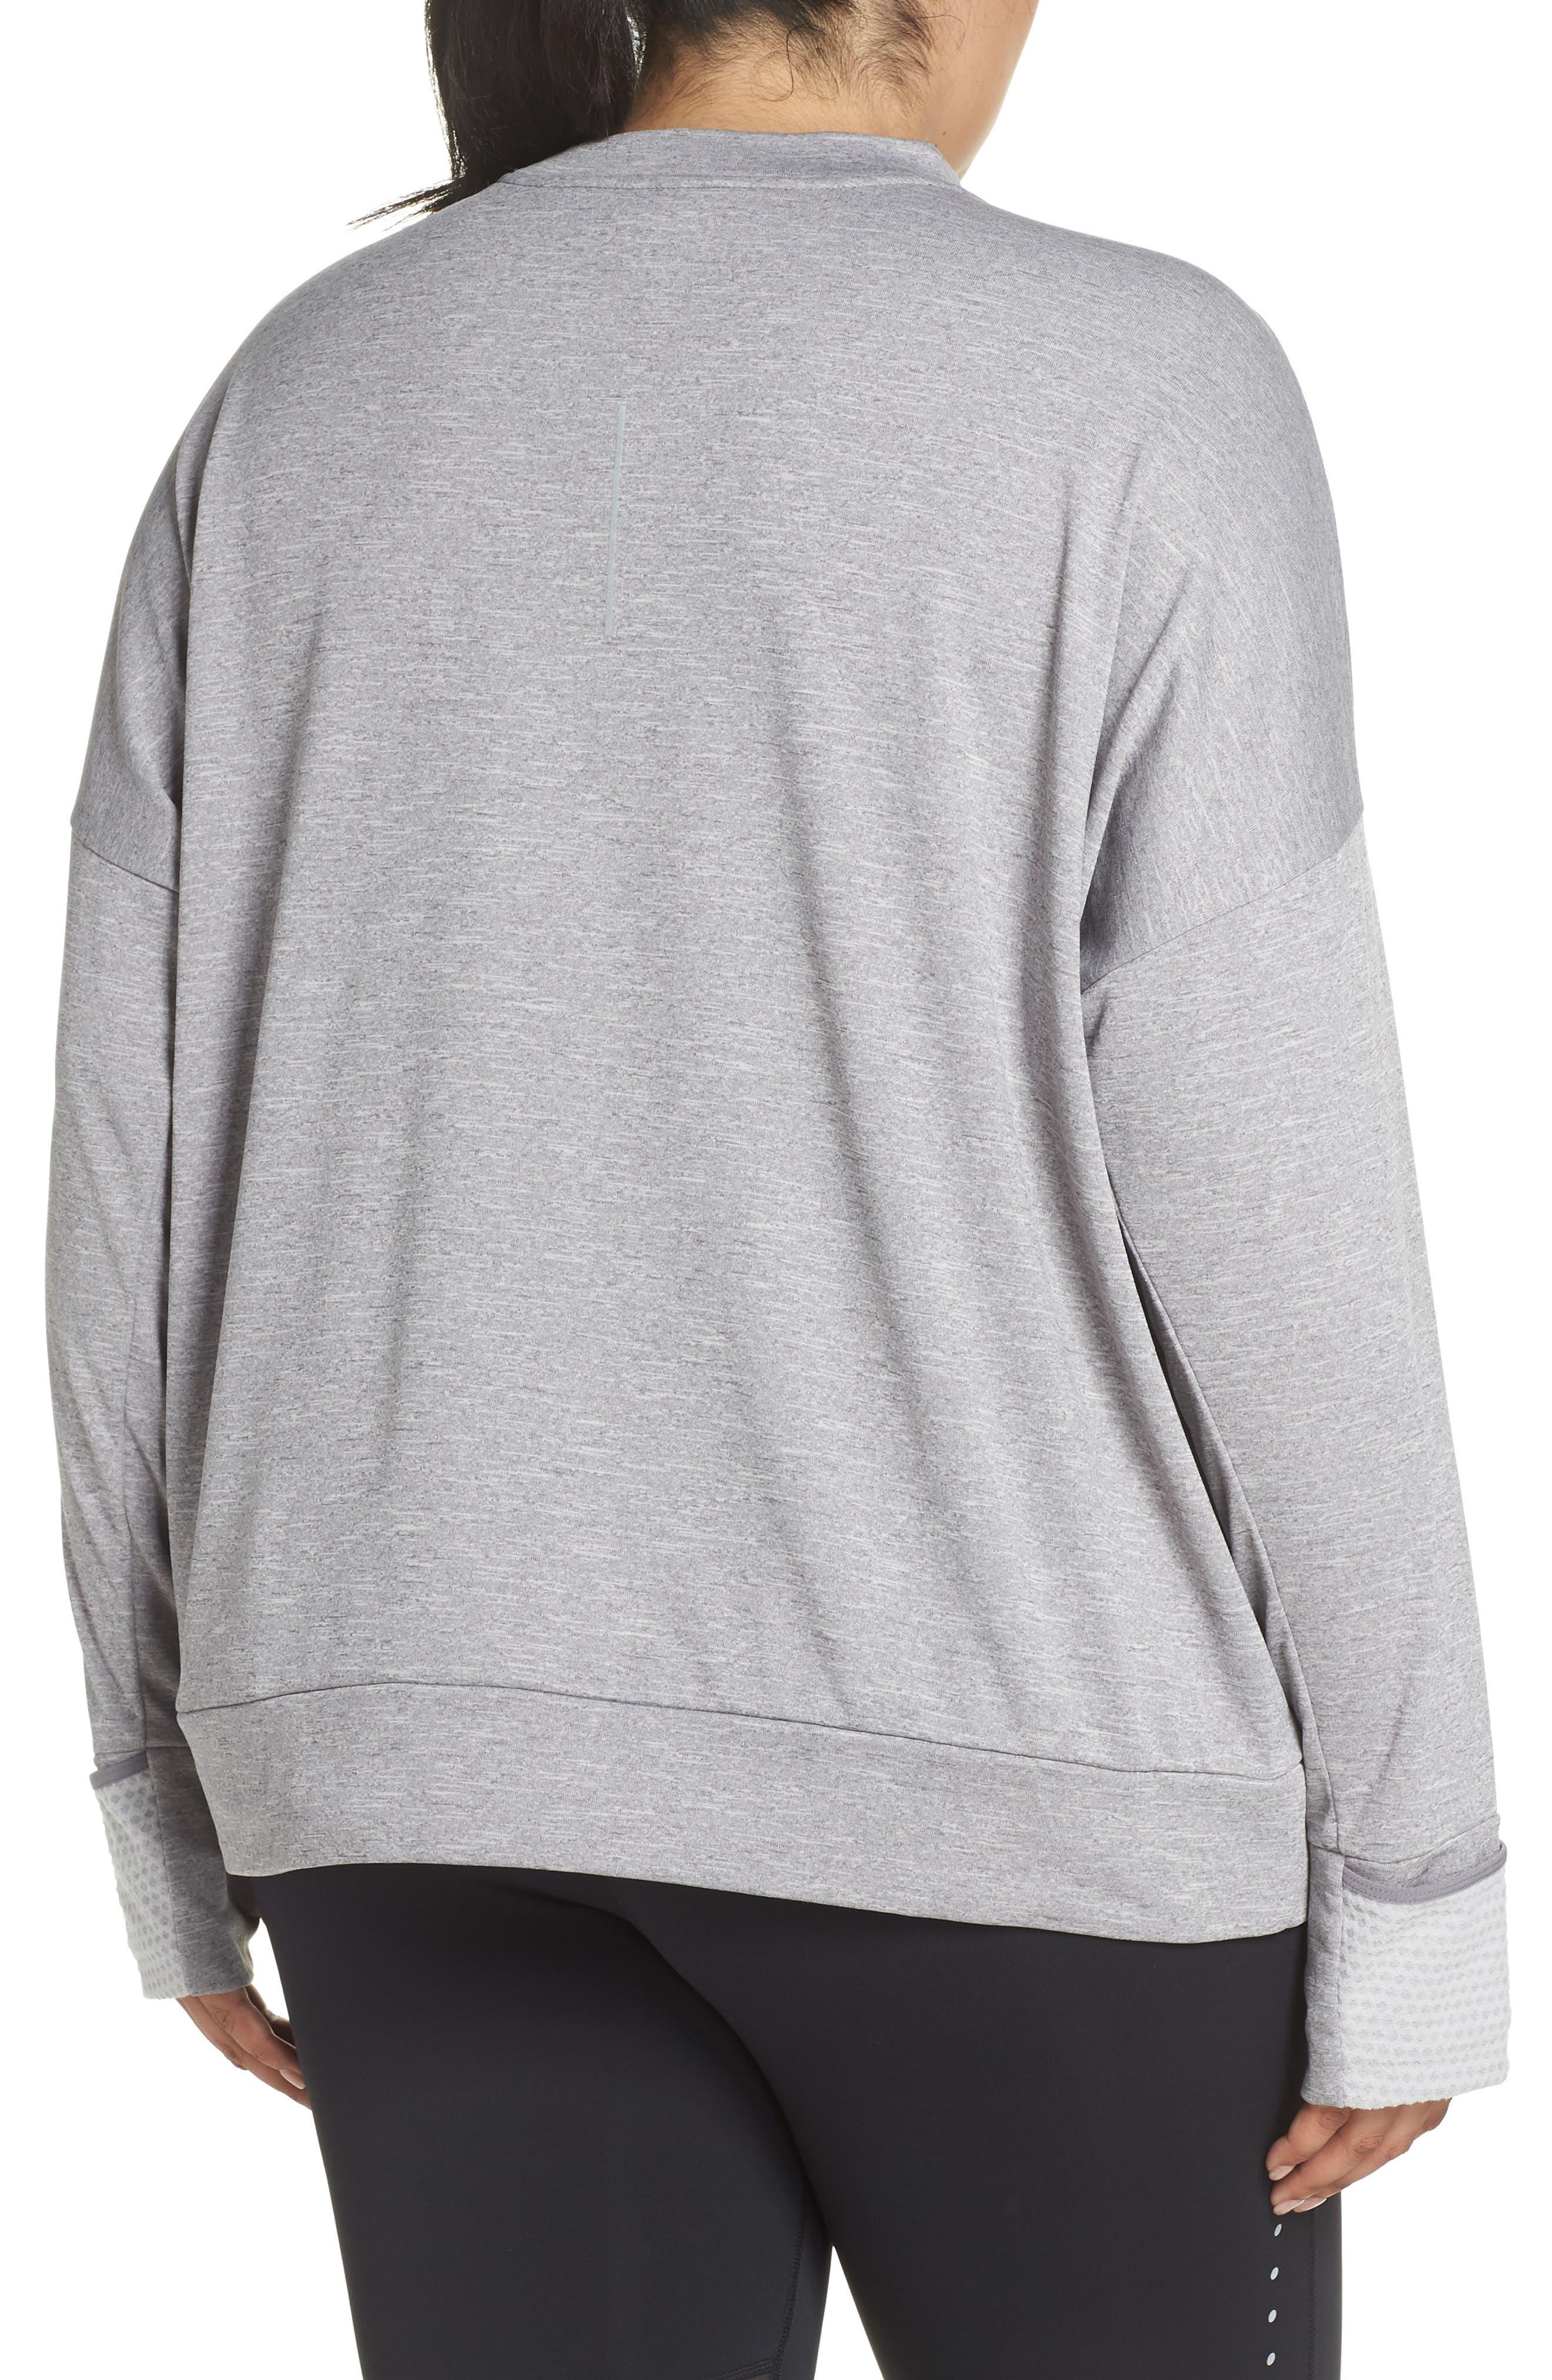 c1be9f70d4 Women s Nike Clothing Sale